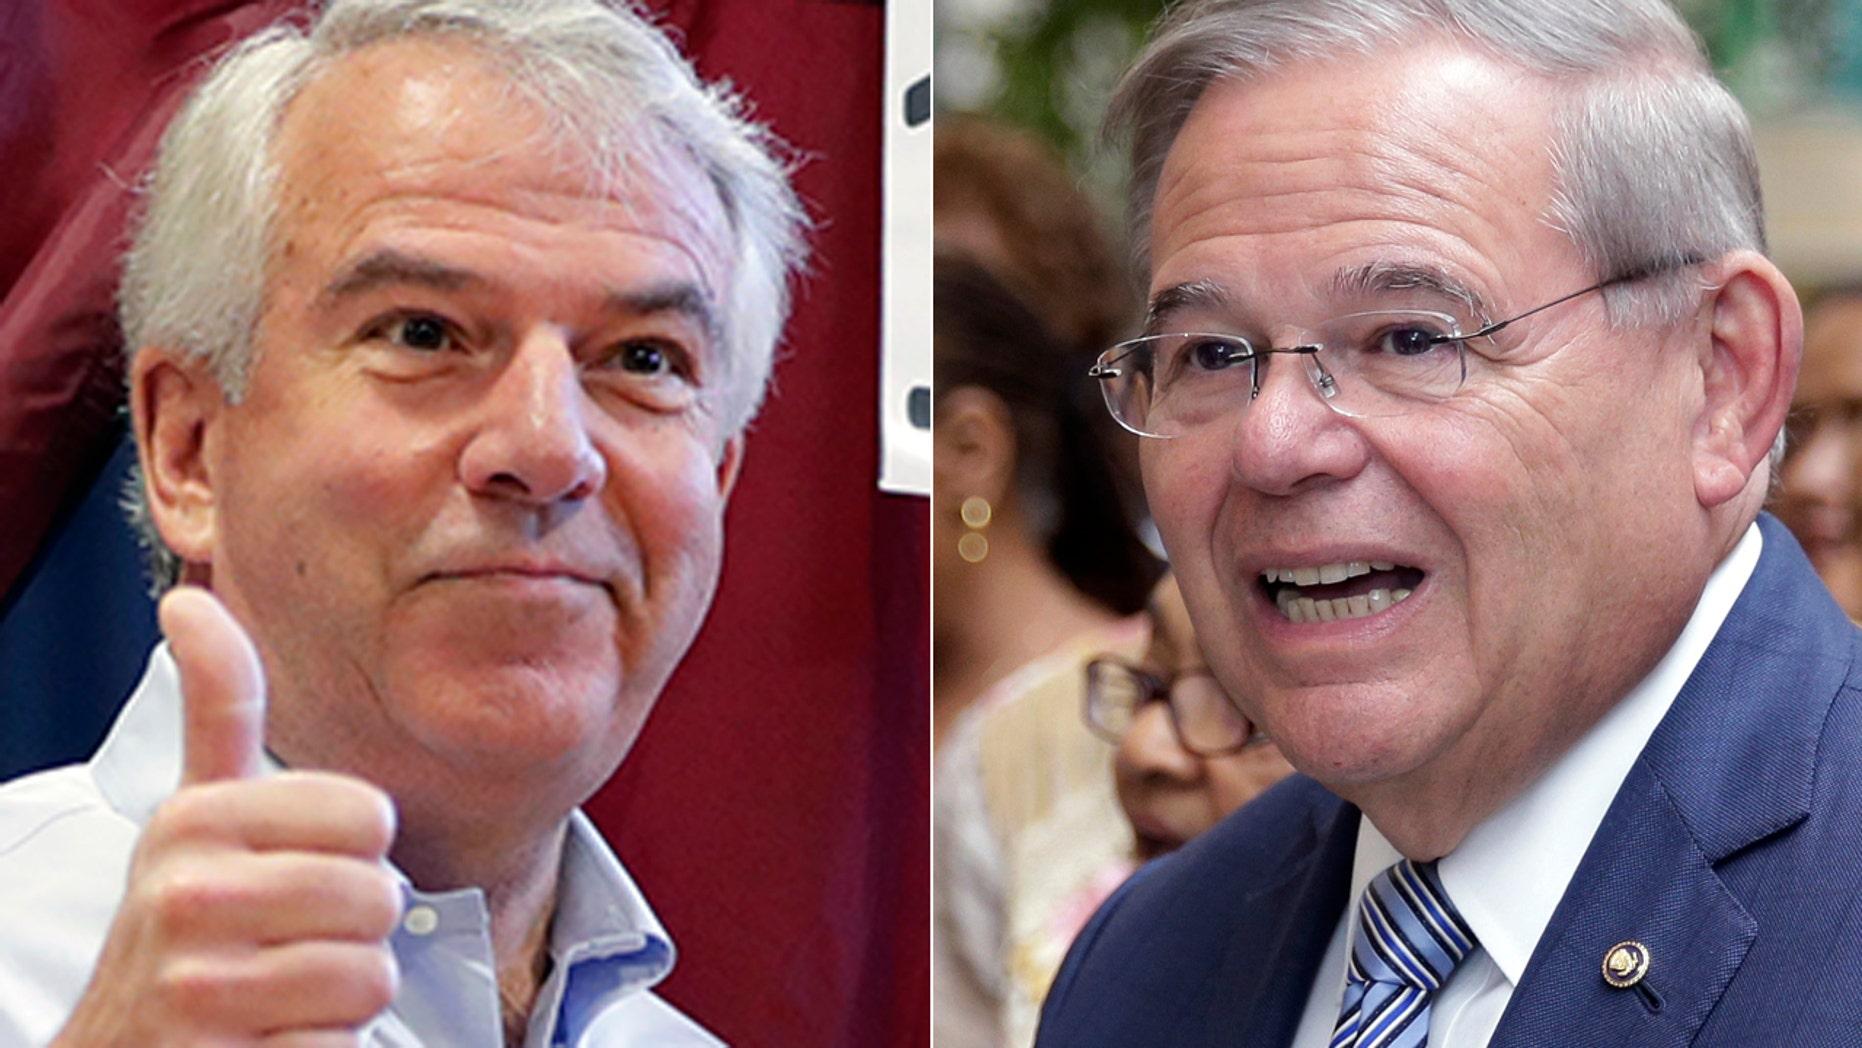 Republican Bob Hugin, left, will challenge Sen. Bob Menendez, D-N.J., in November's general election.